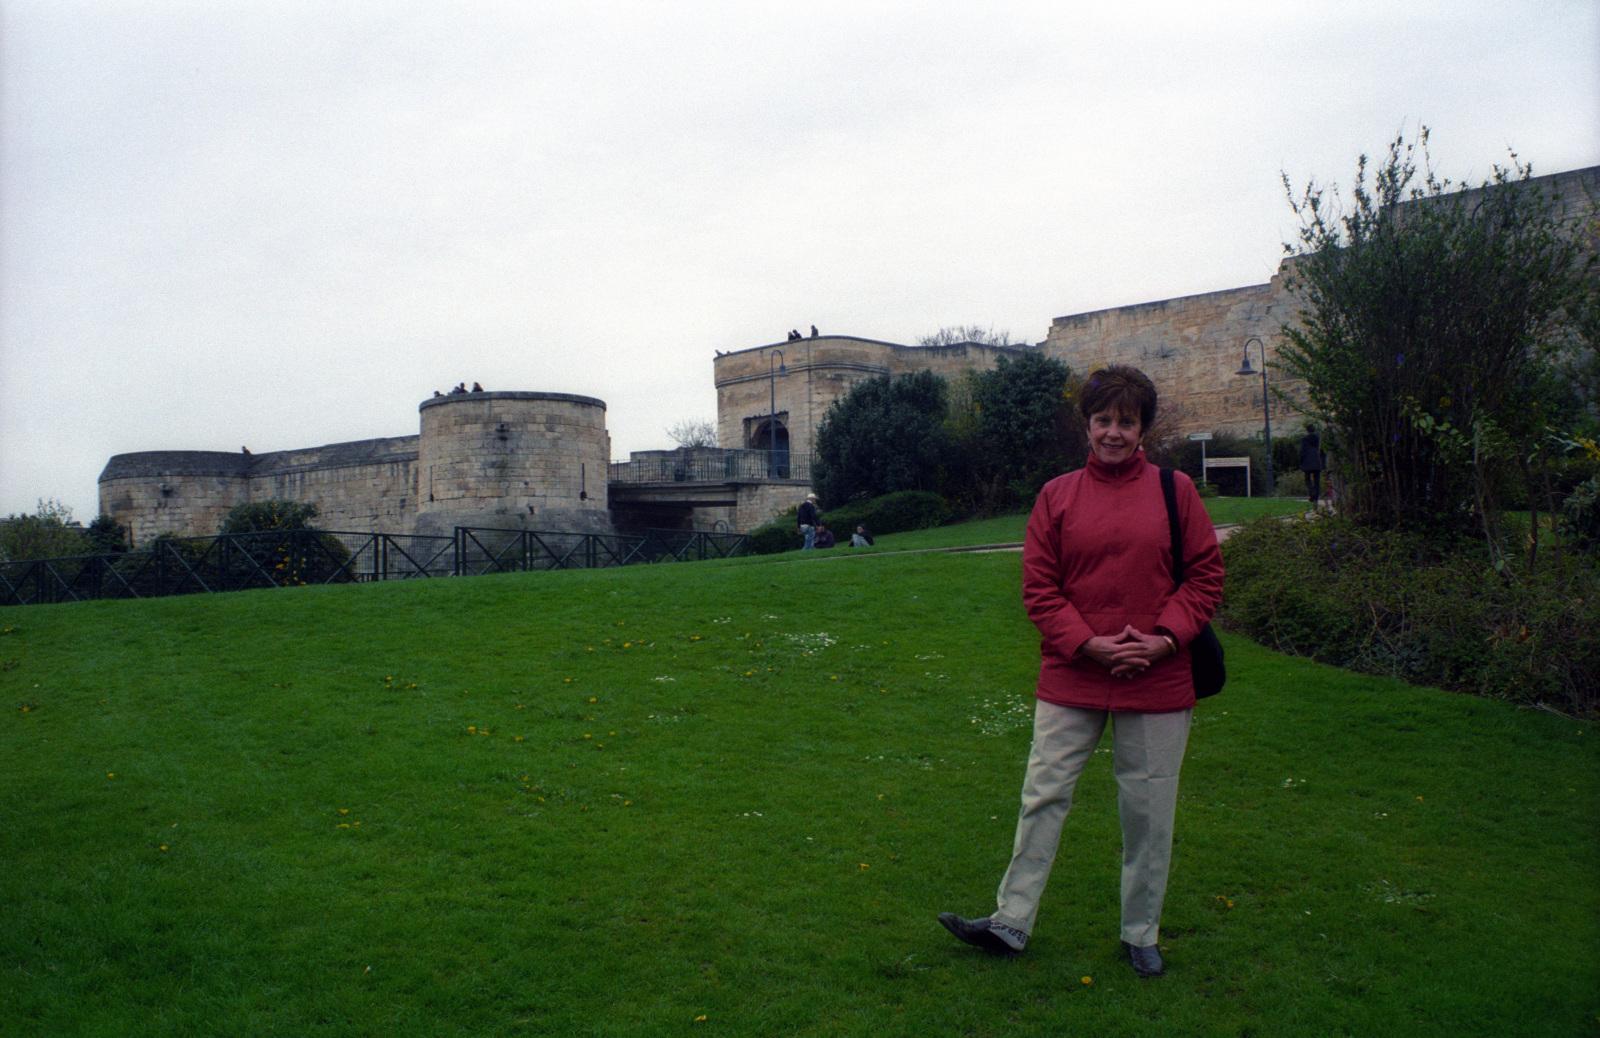 William the Conqueror's Castle